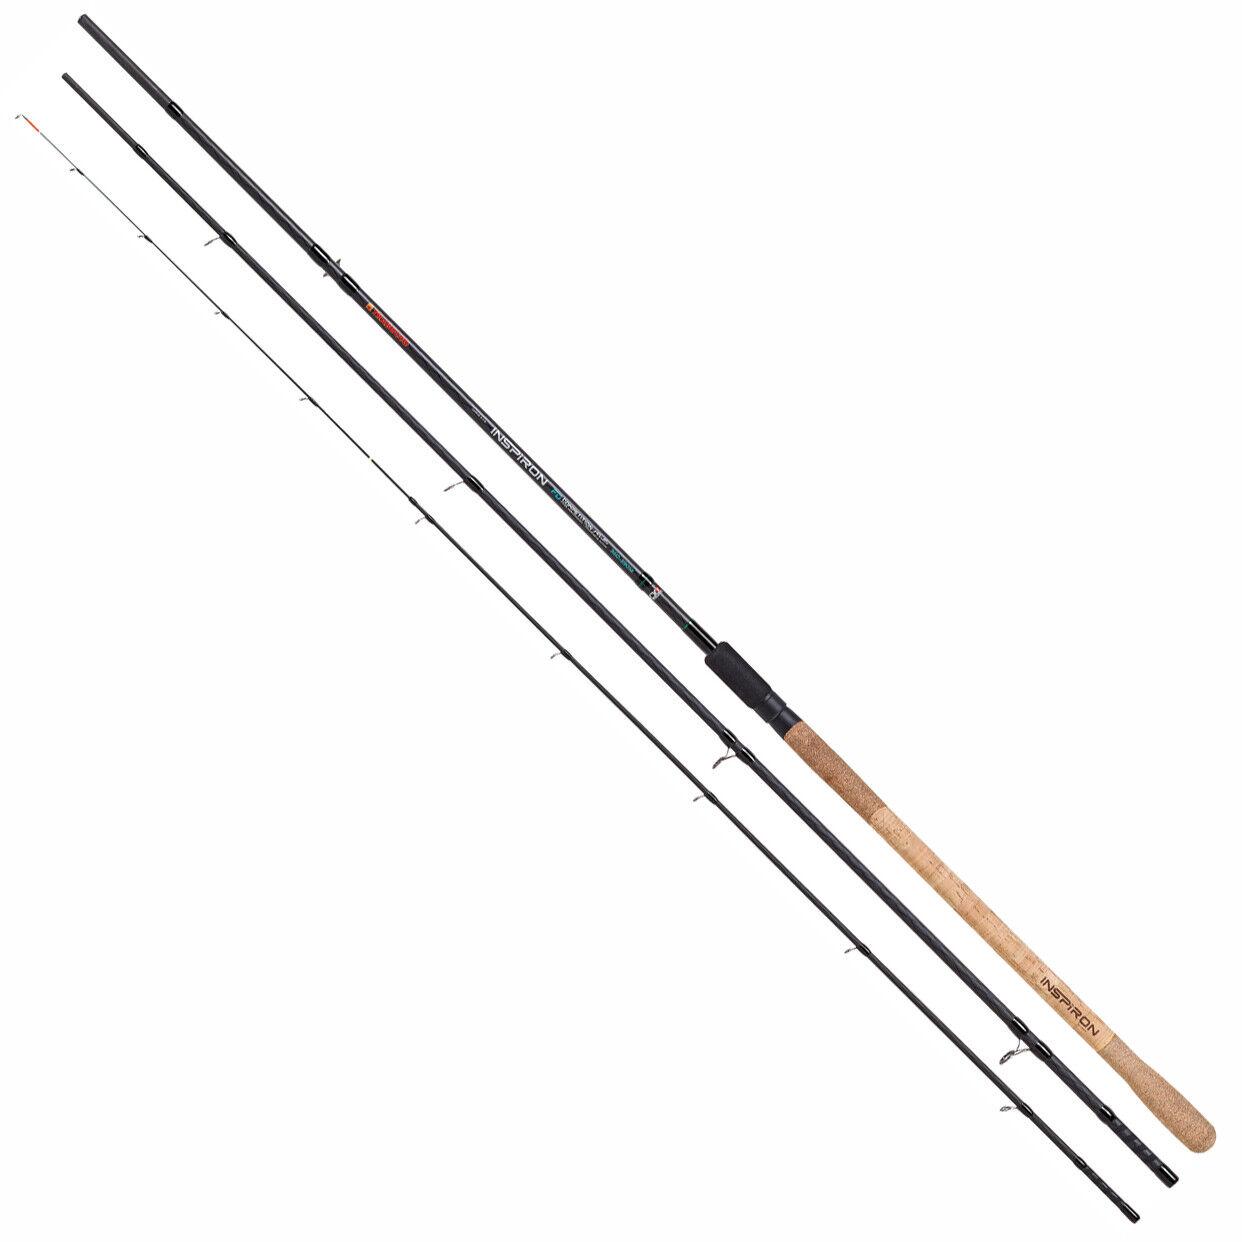 15302360 Canna Pesca Feeder Trabucco Inspiron Competition Multi 3,30-3,60m FEU